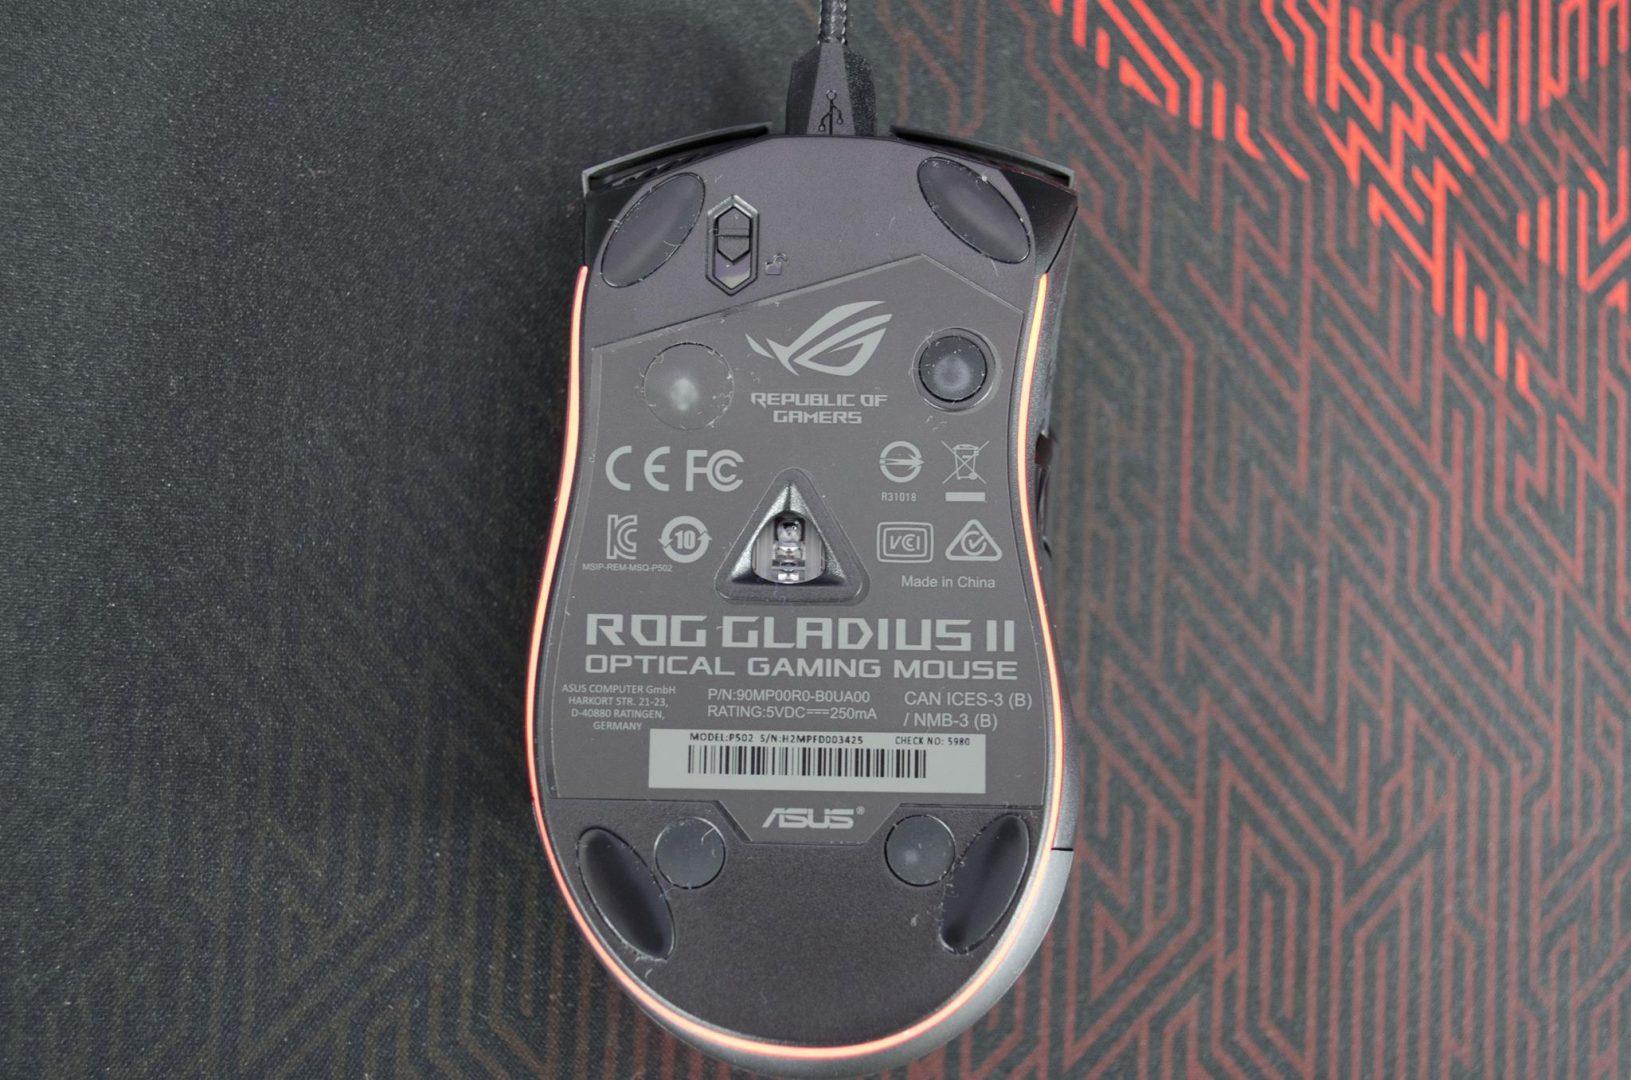 asus rog gladius ii gaming mouse review_7